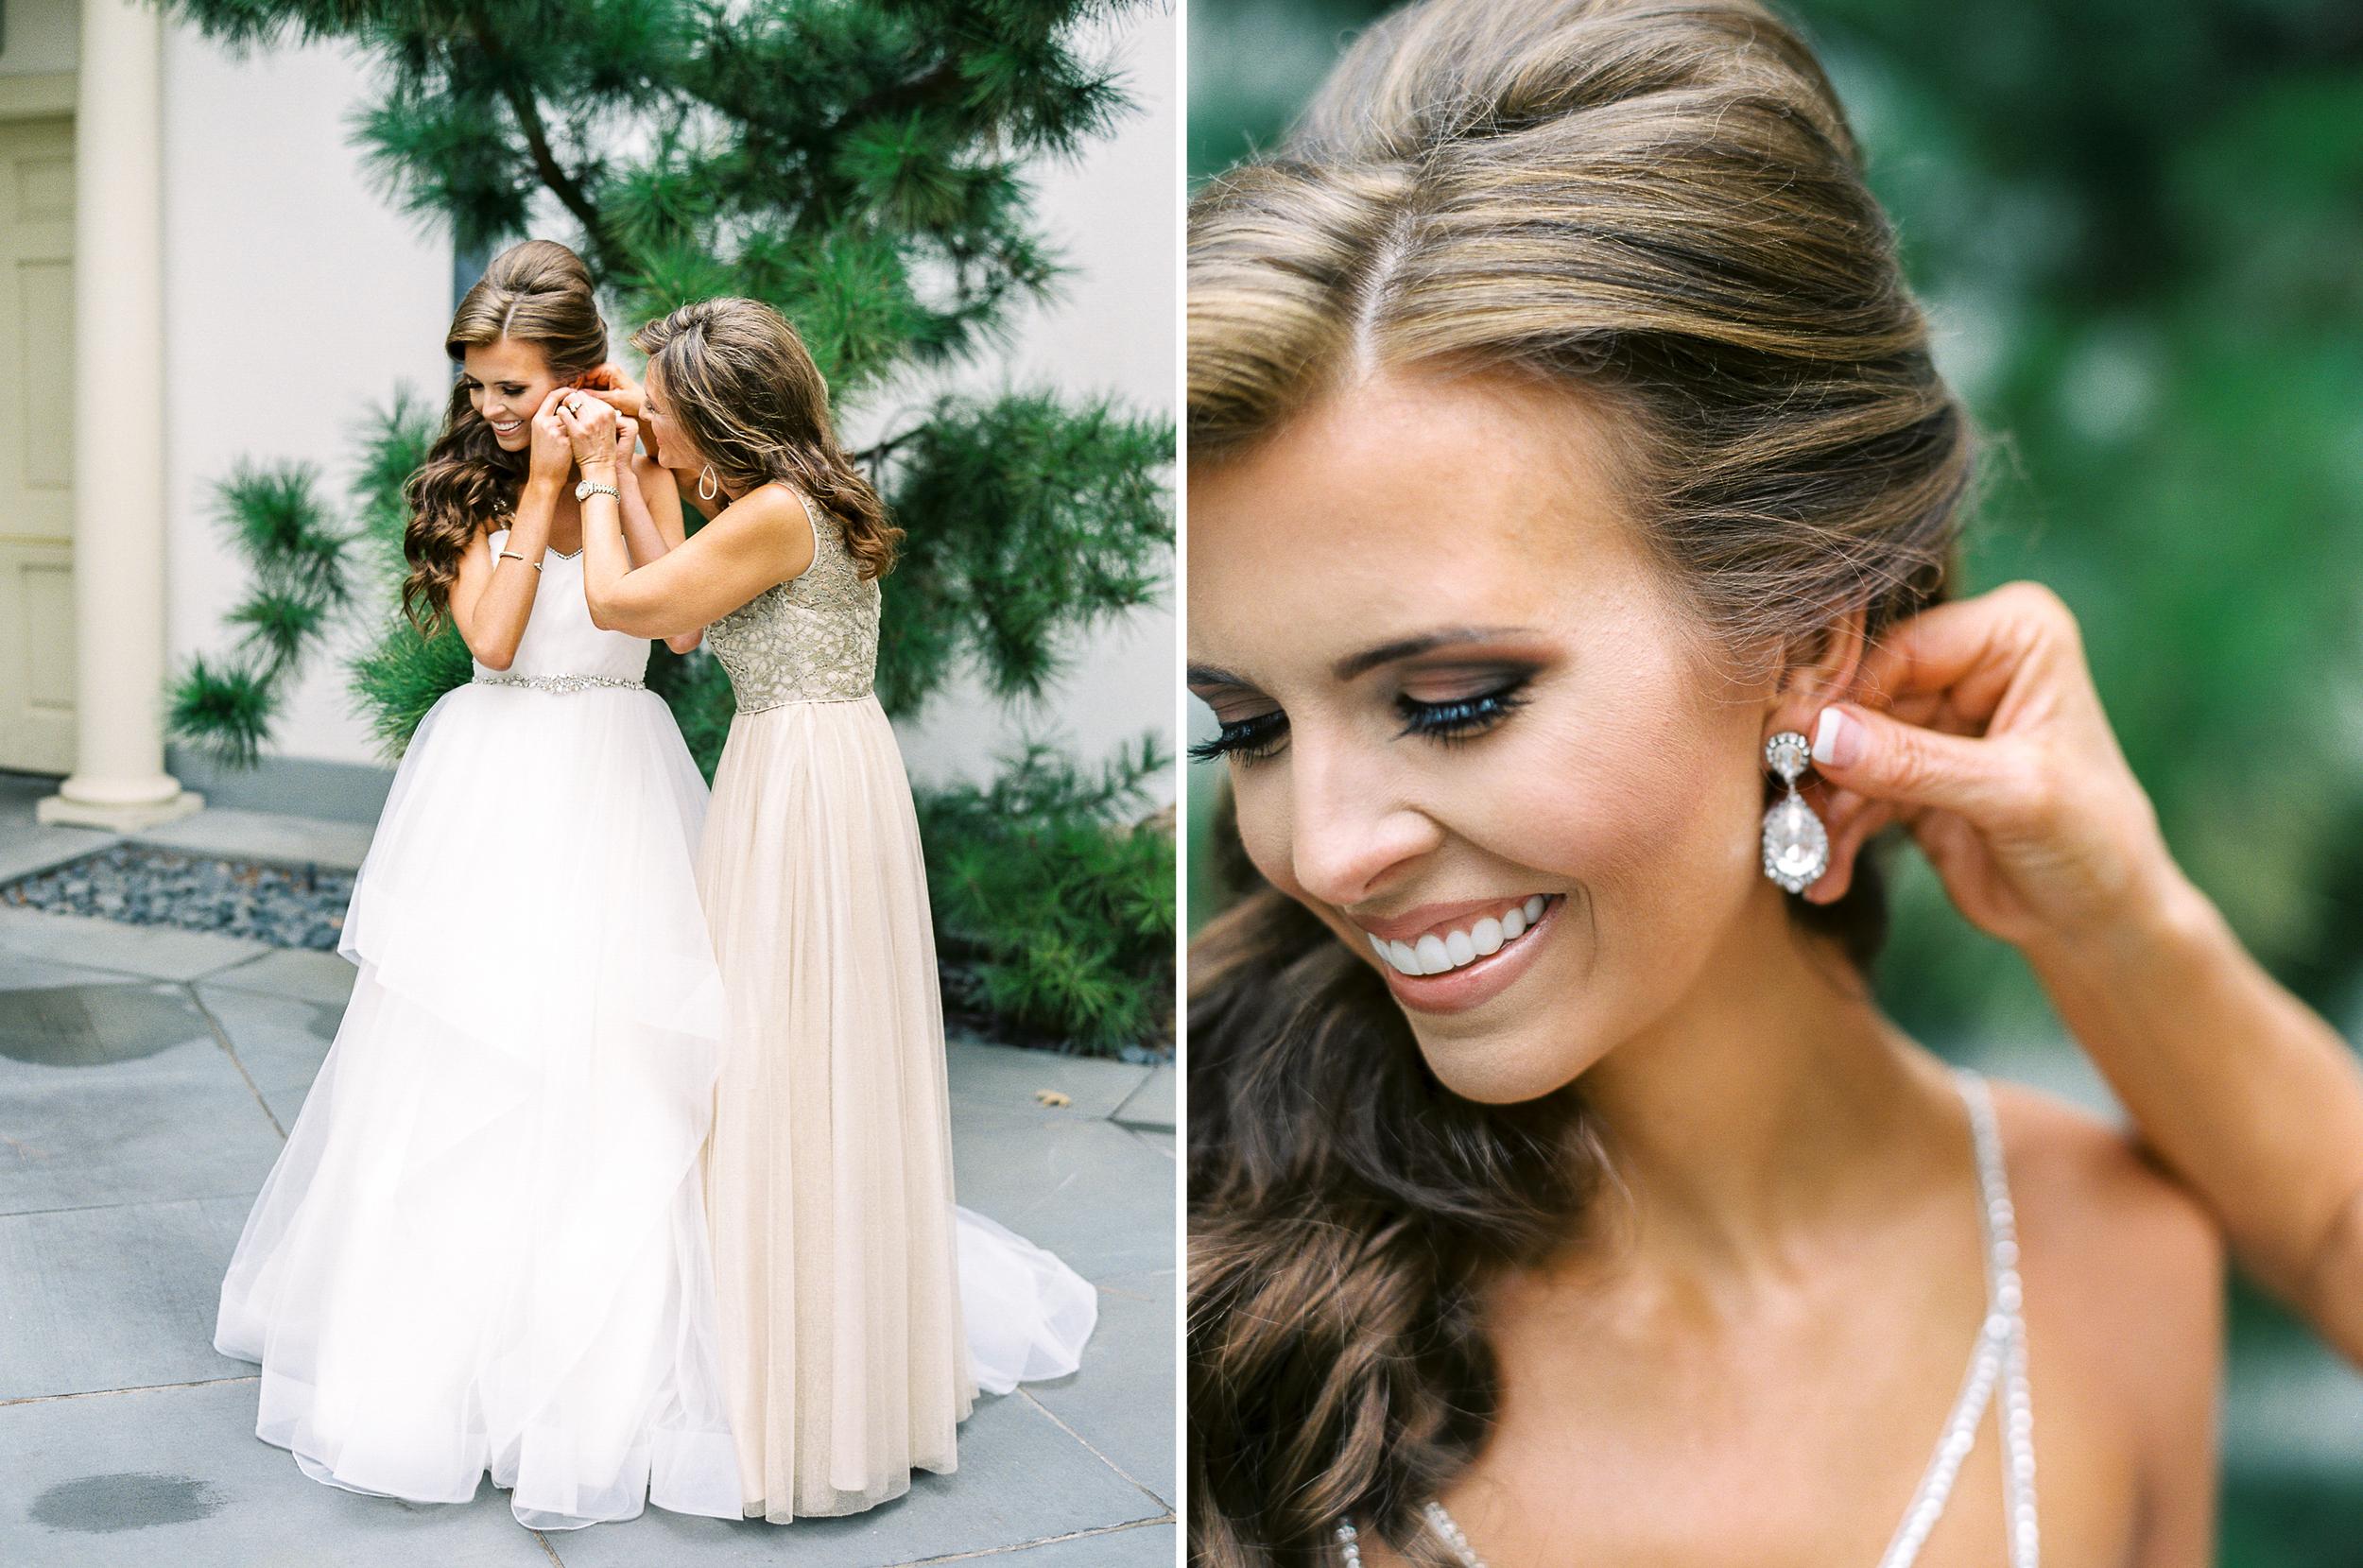 Dana-Fernandez-Photography-Weddings-in-Houston-Magazine-feature-Houston-wedding-photographer-film-101.jpg